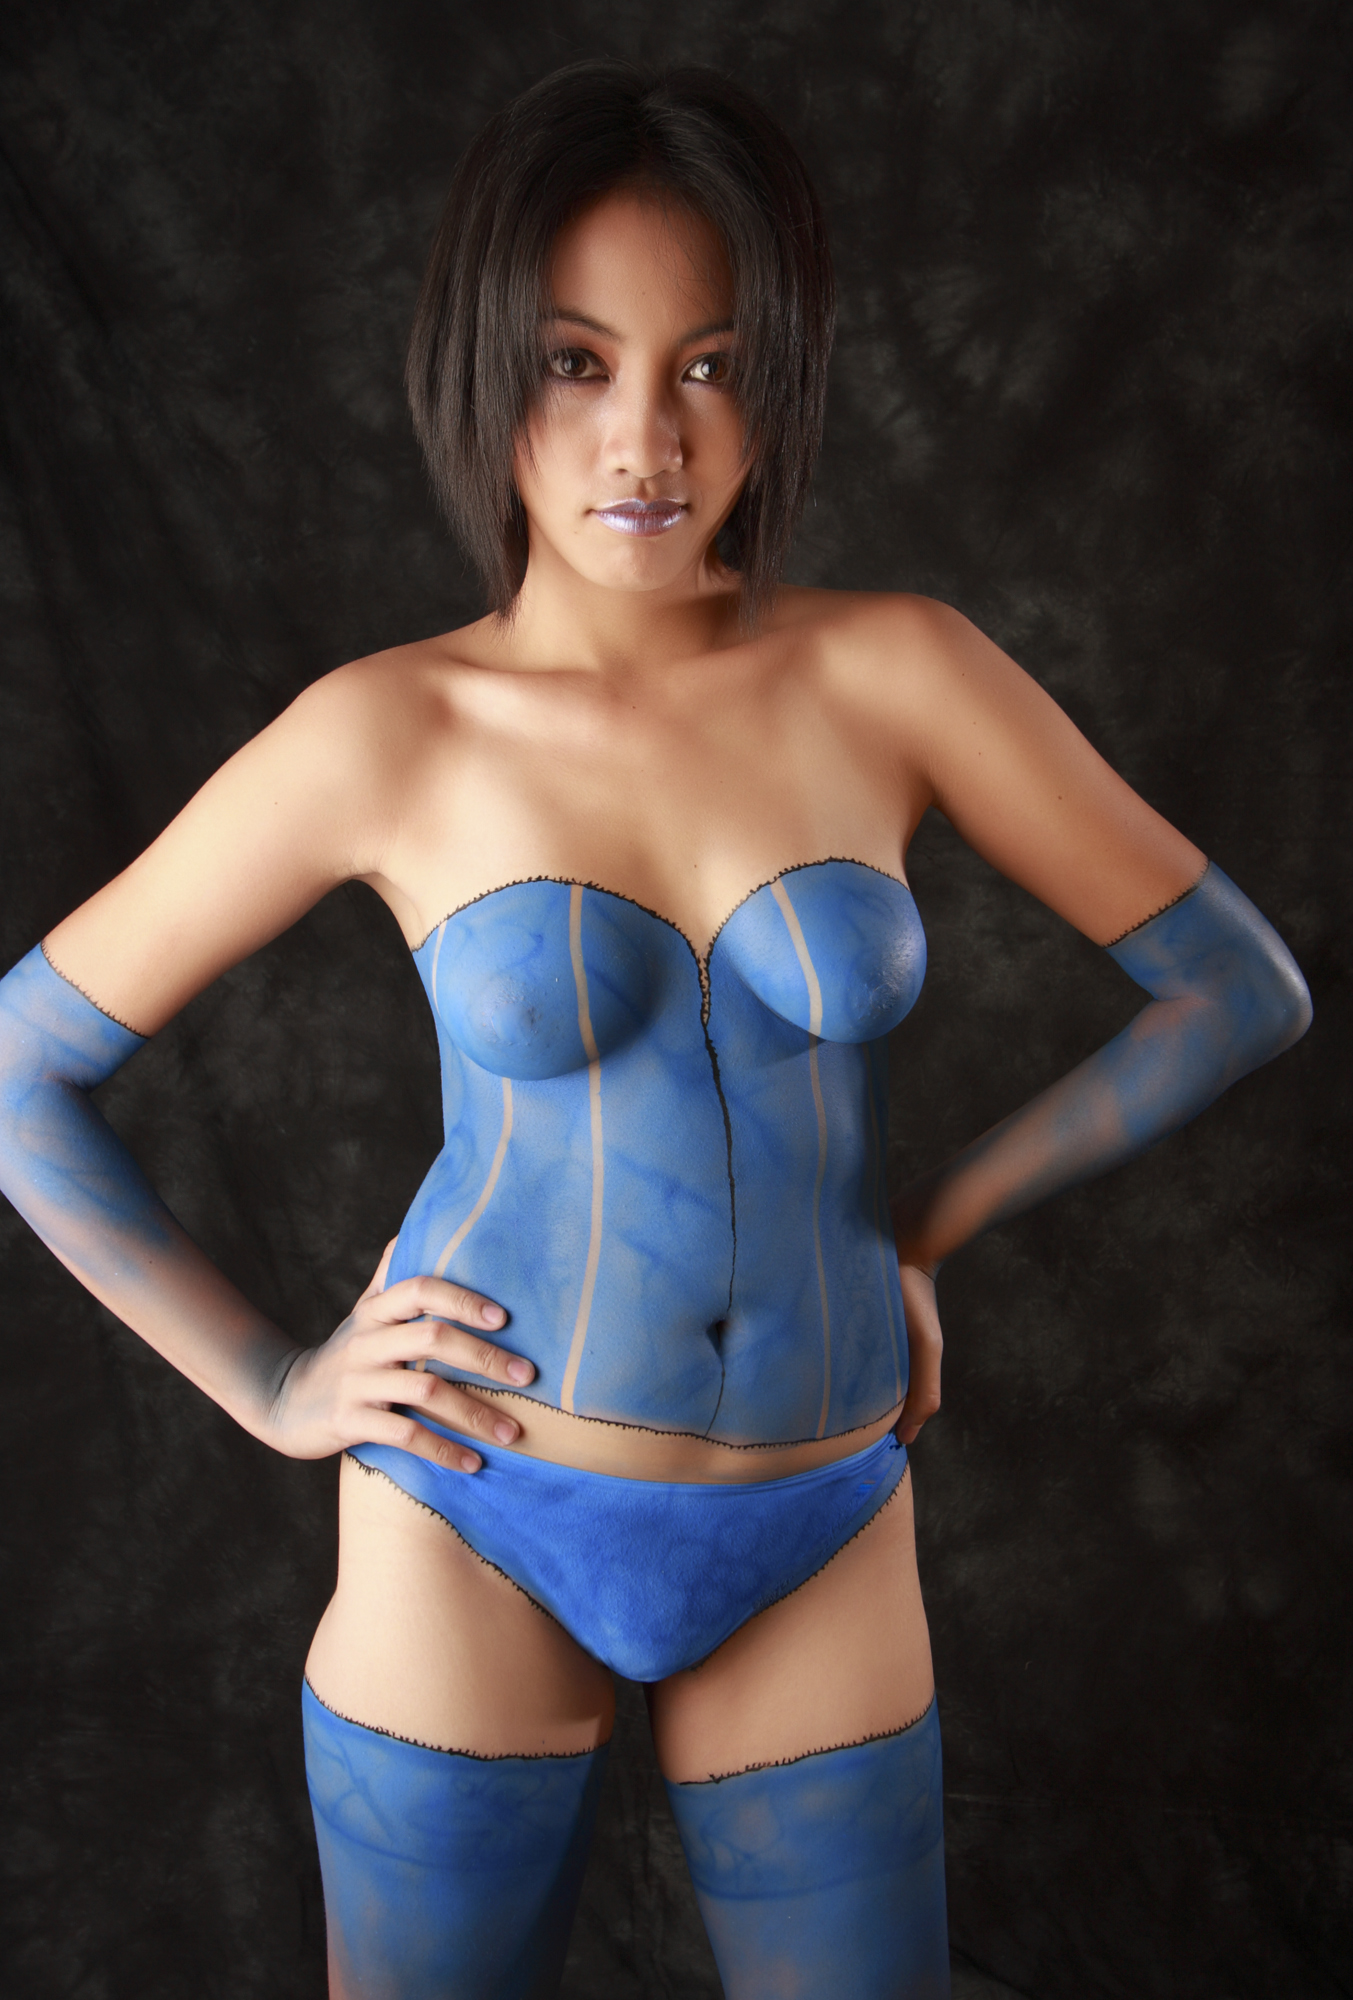 Erotic body art images